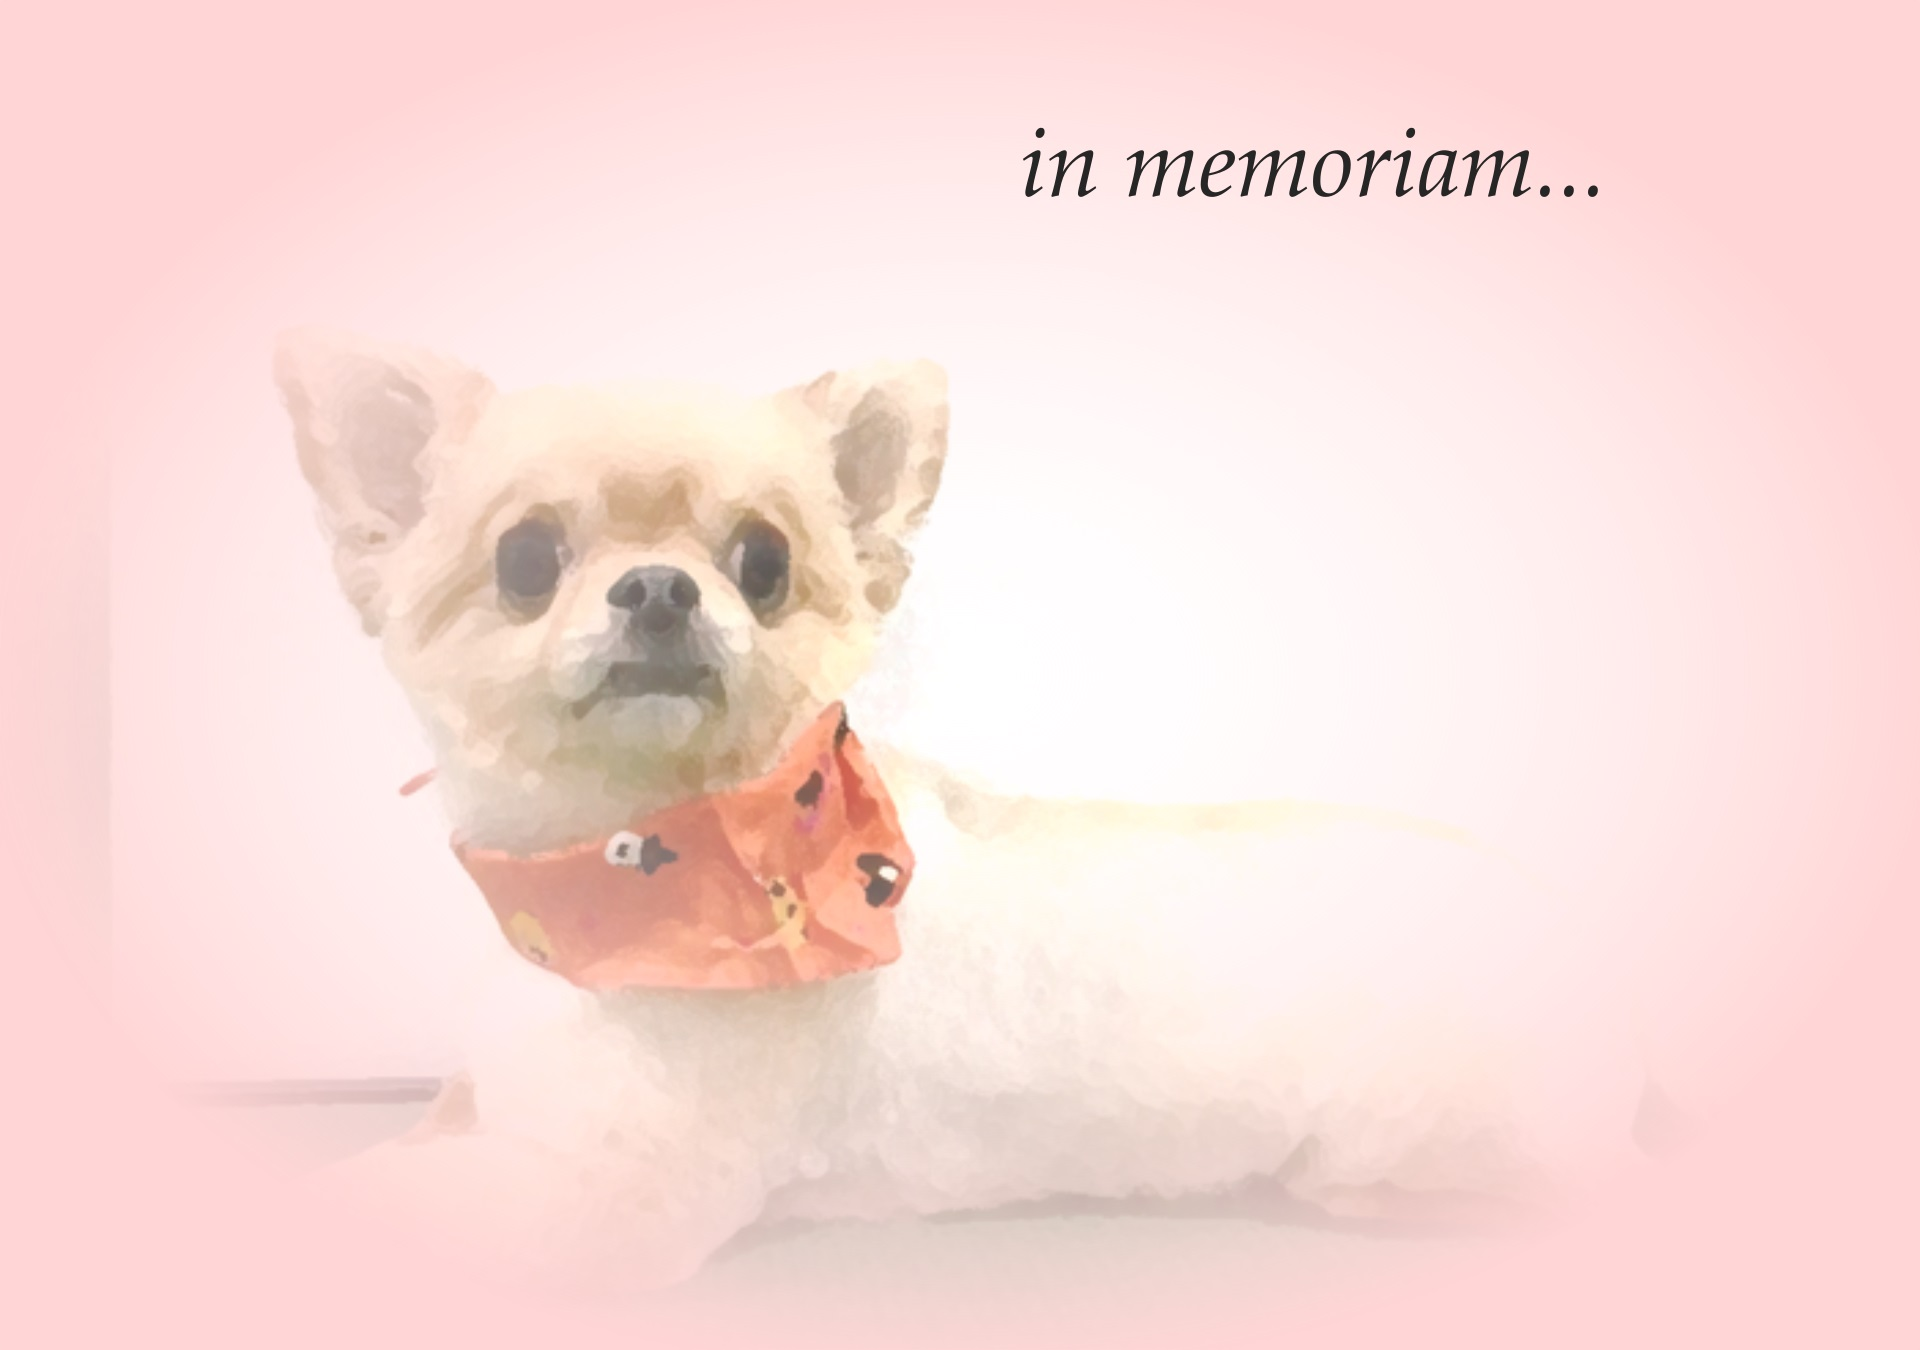 in memoriam 愛犬を悼んで